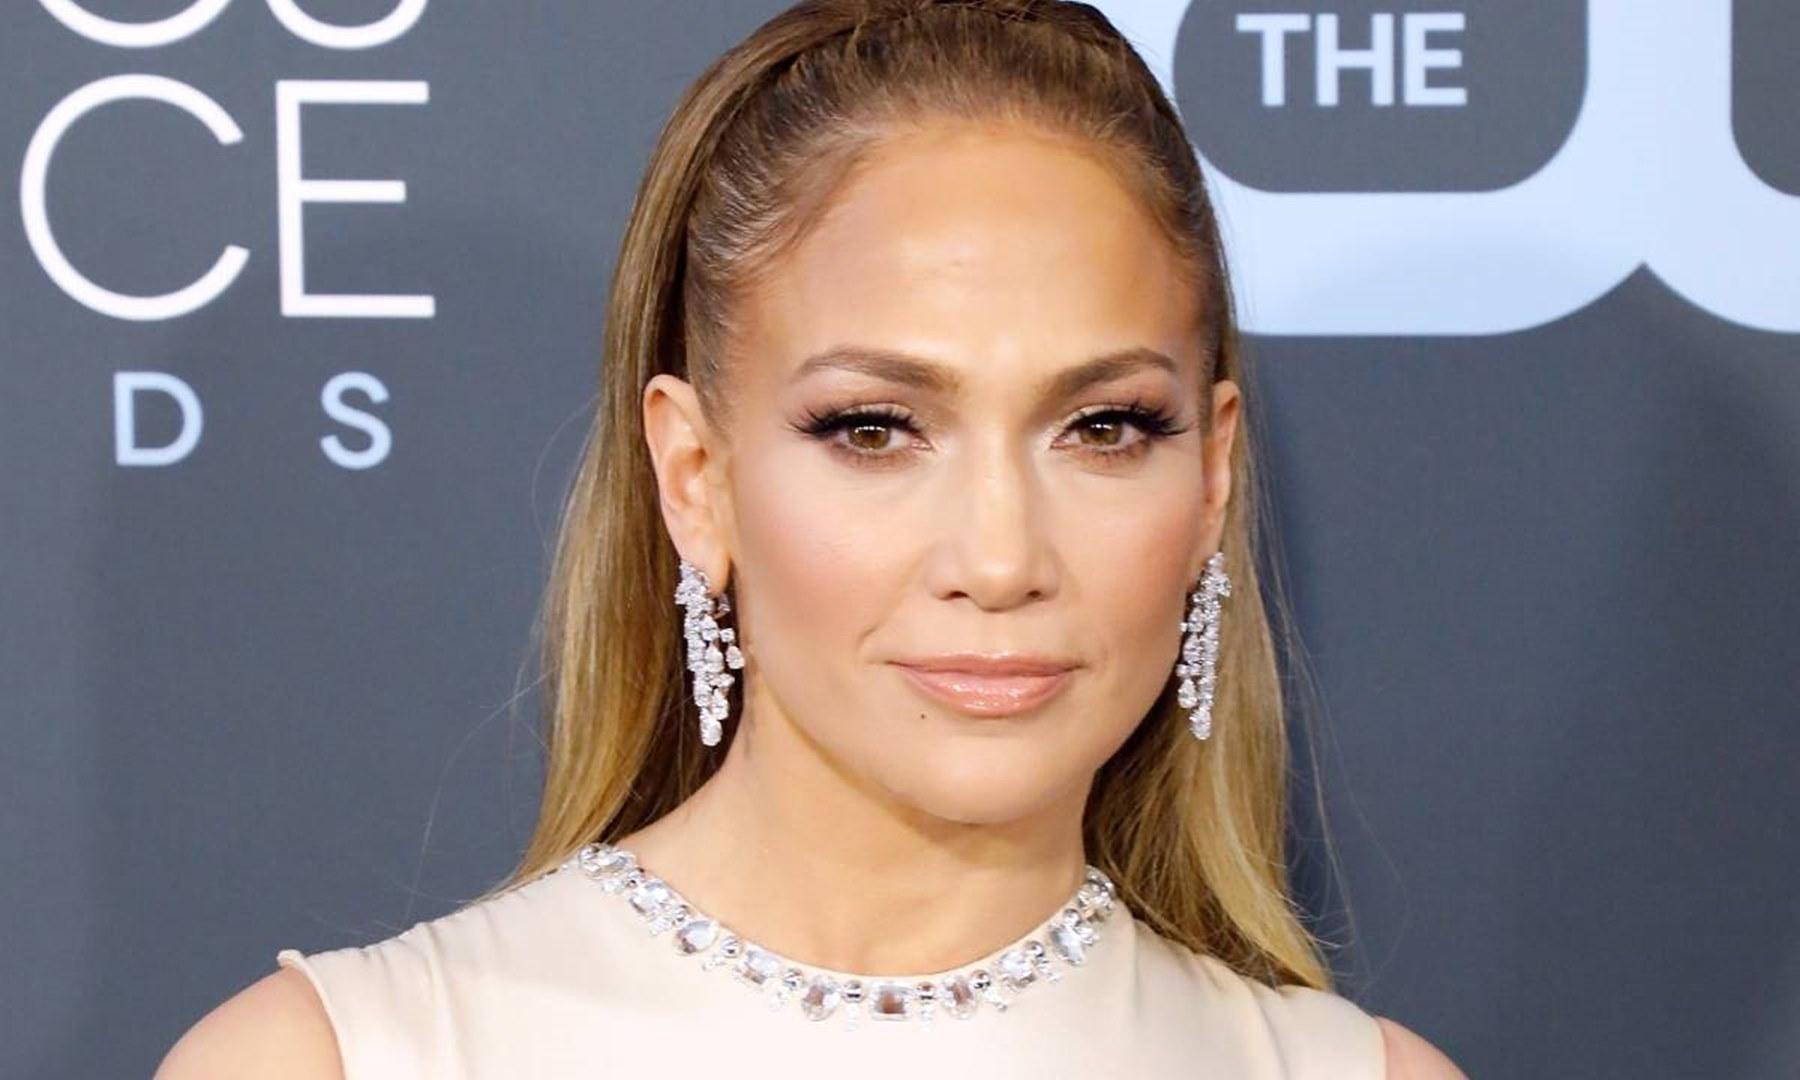 SUPER BOWL: Jennifer Lopez, Shakira put on one hot halftime show